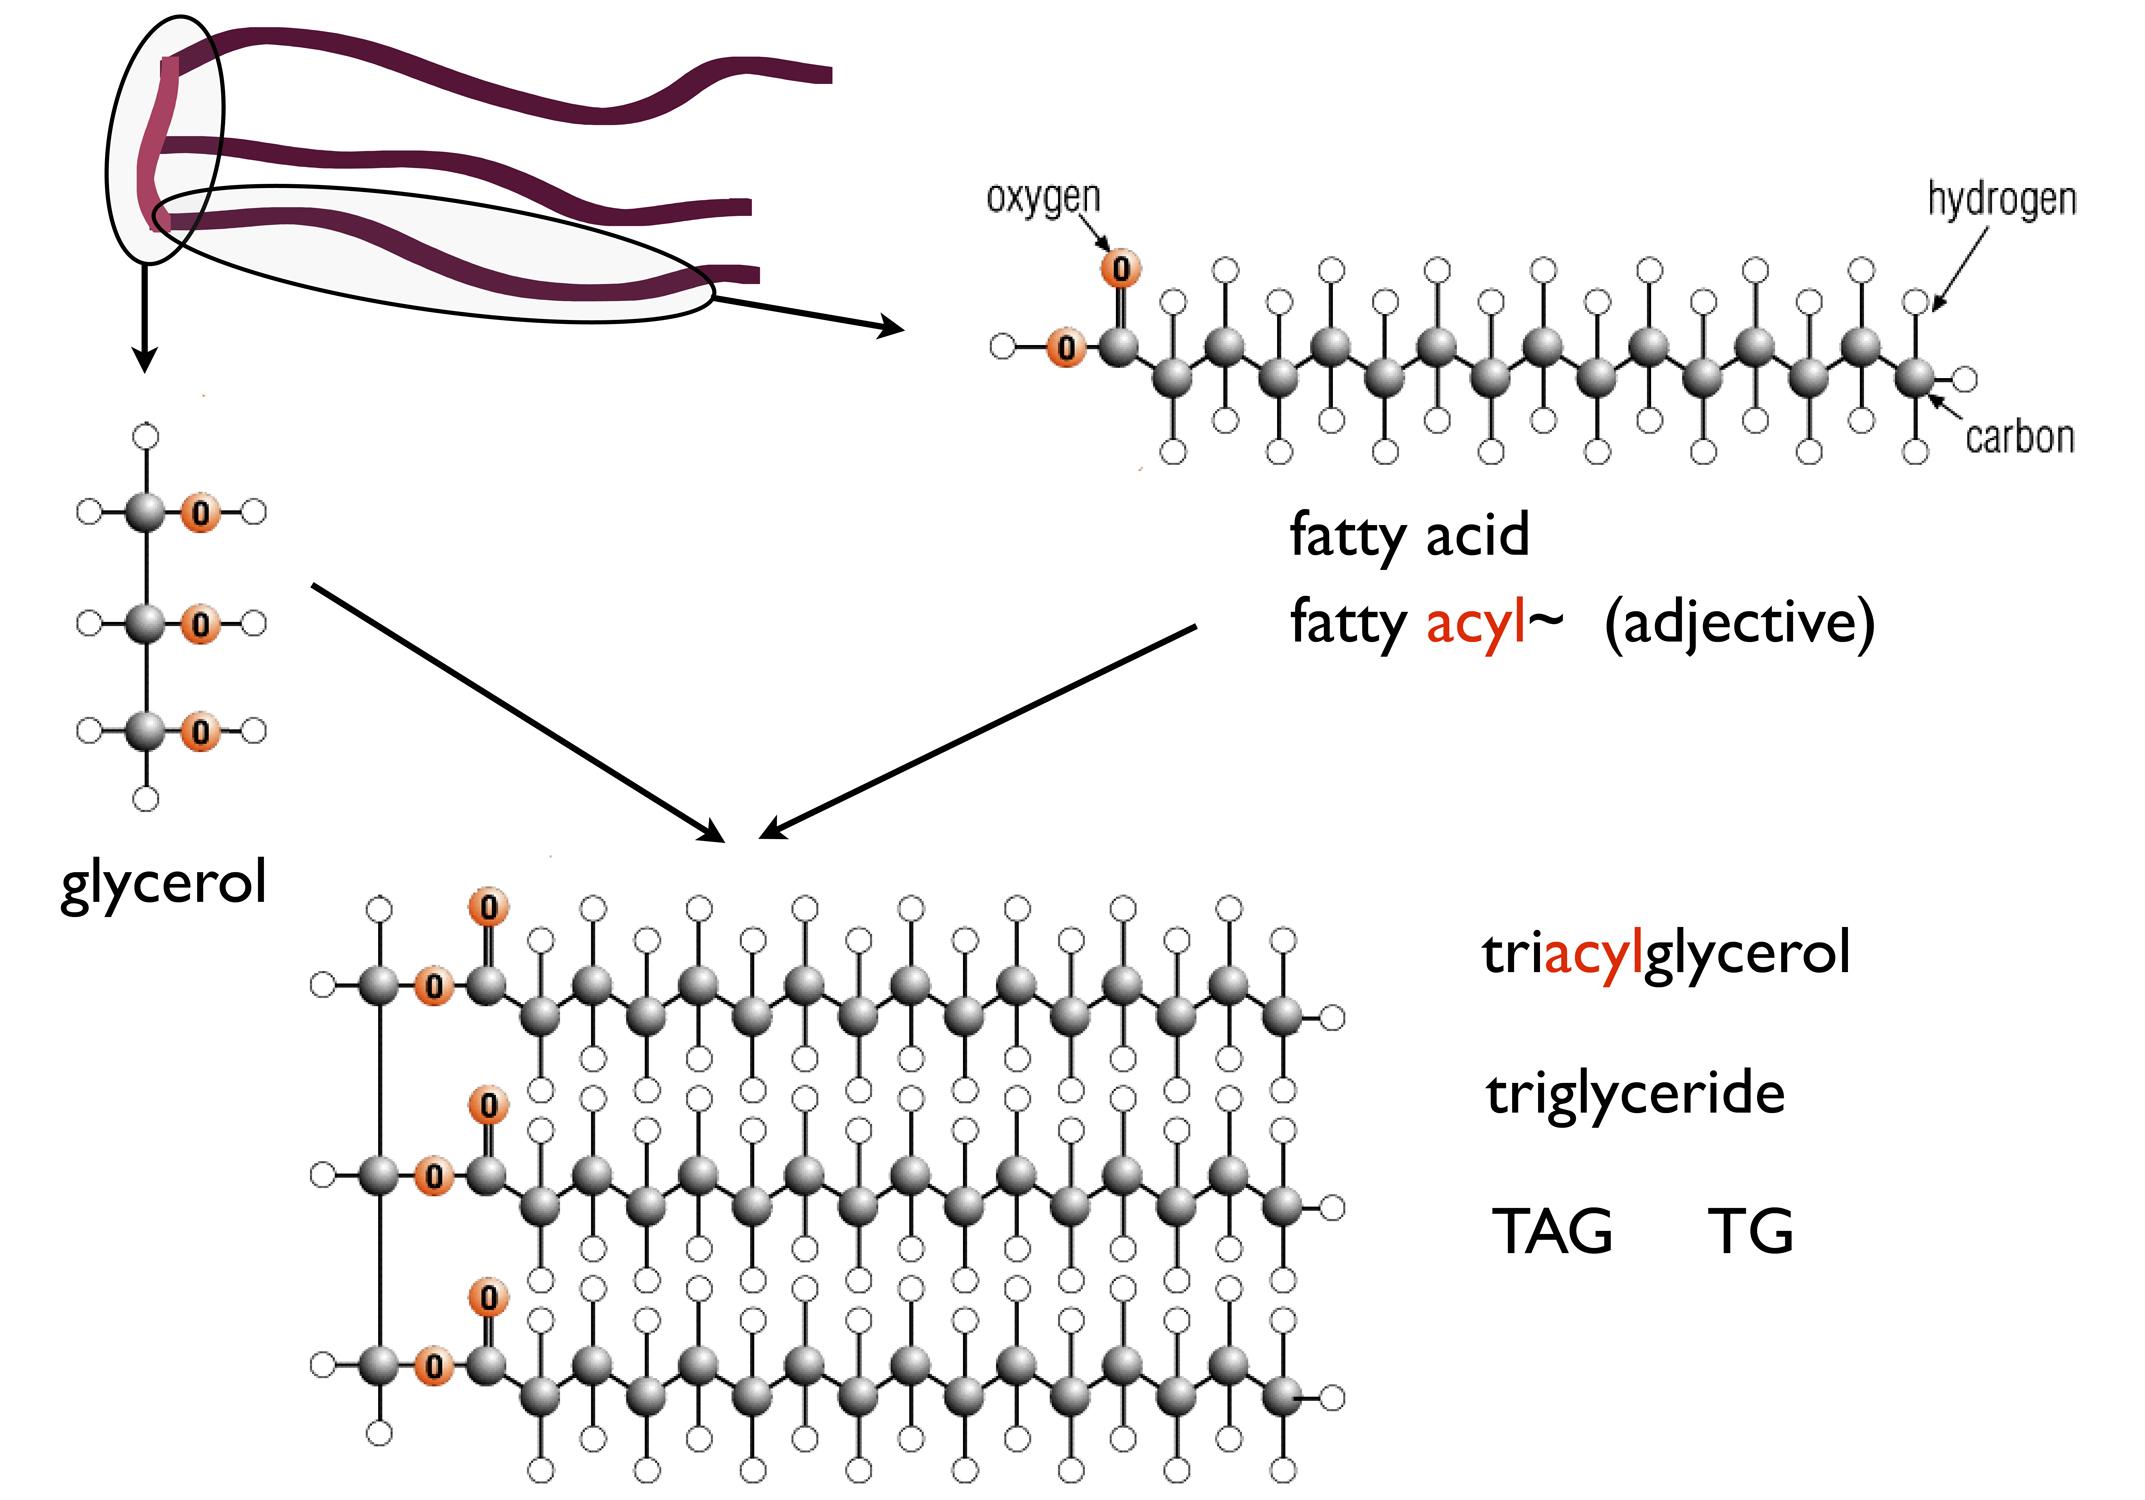 fat structure diagram 5 pin plug wiring intro to fatty acids and triglycerides richard david feinman